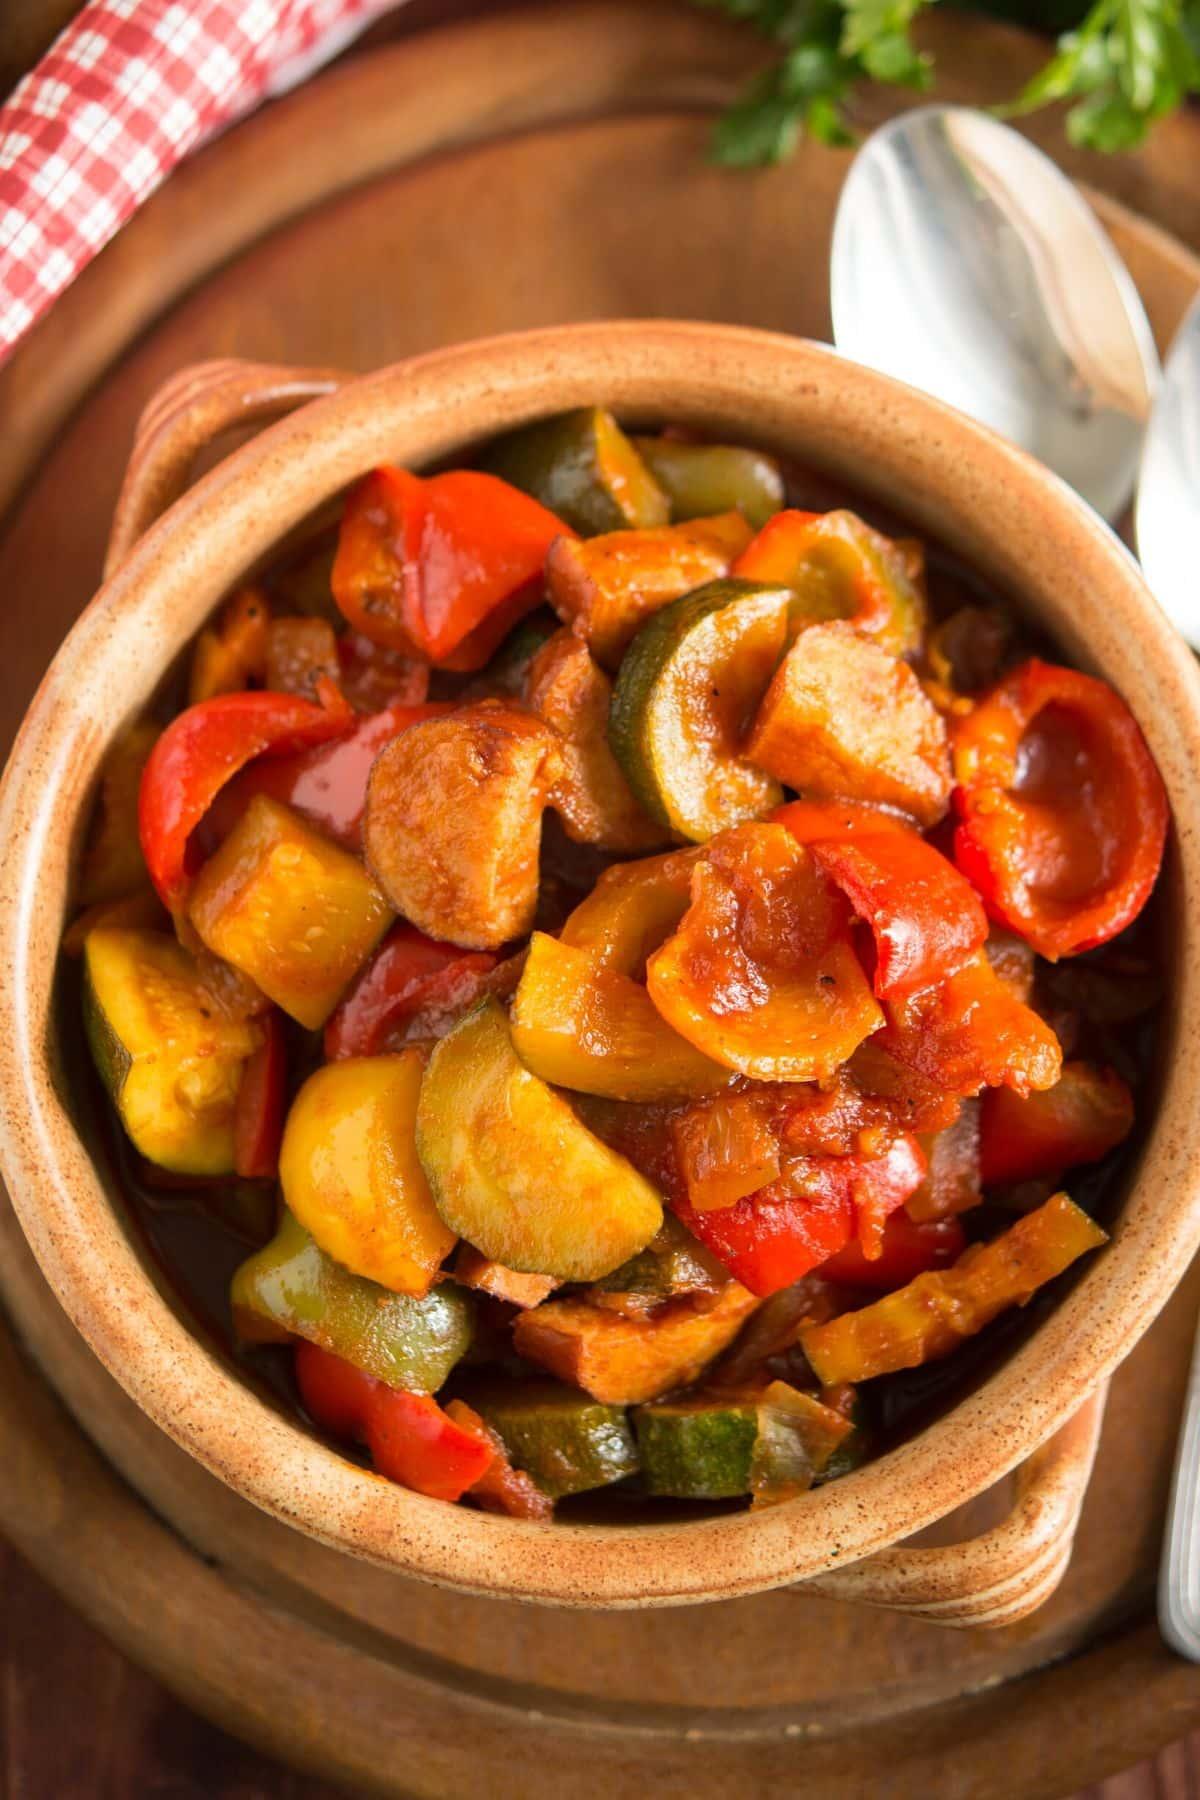 zucchini with tomato sauce